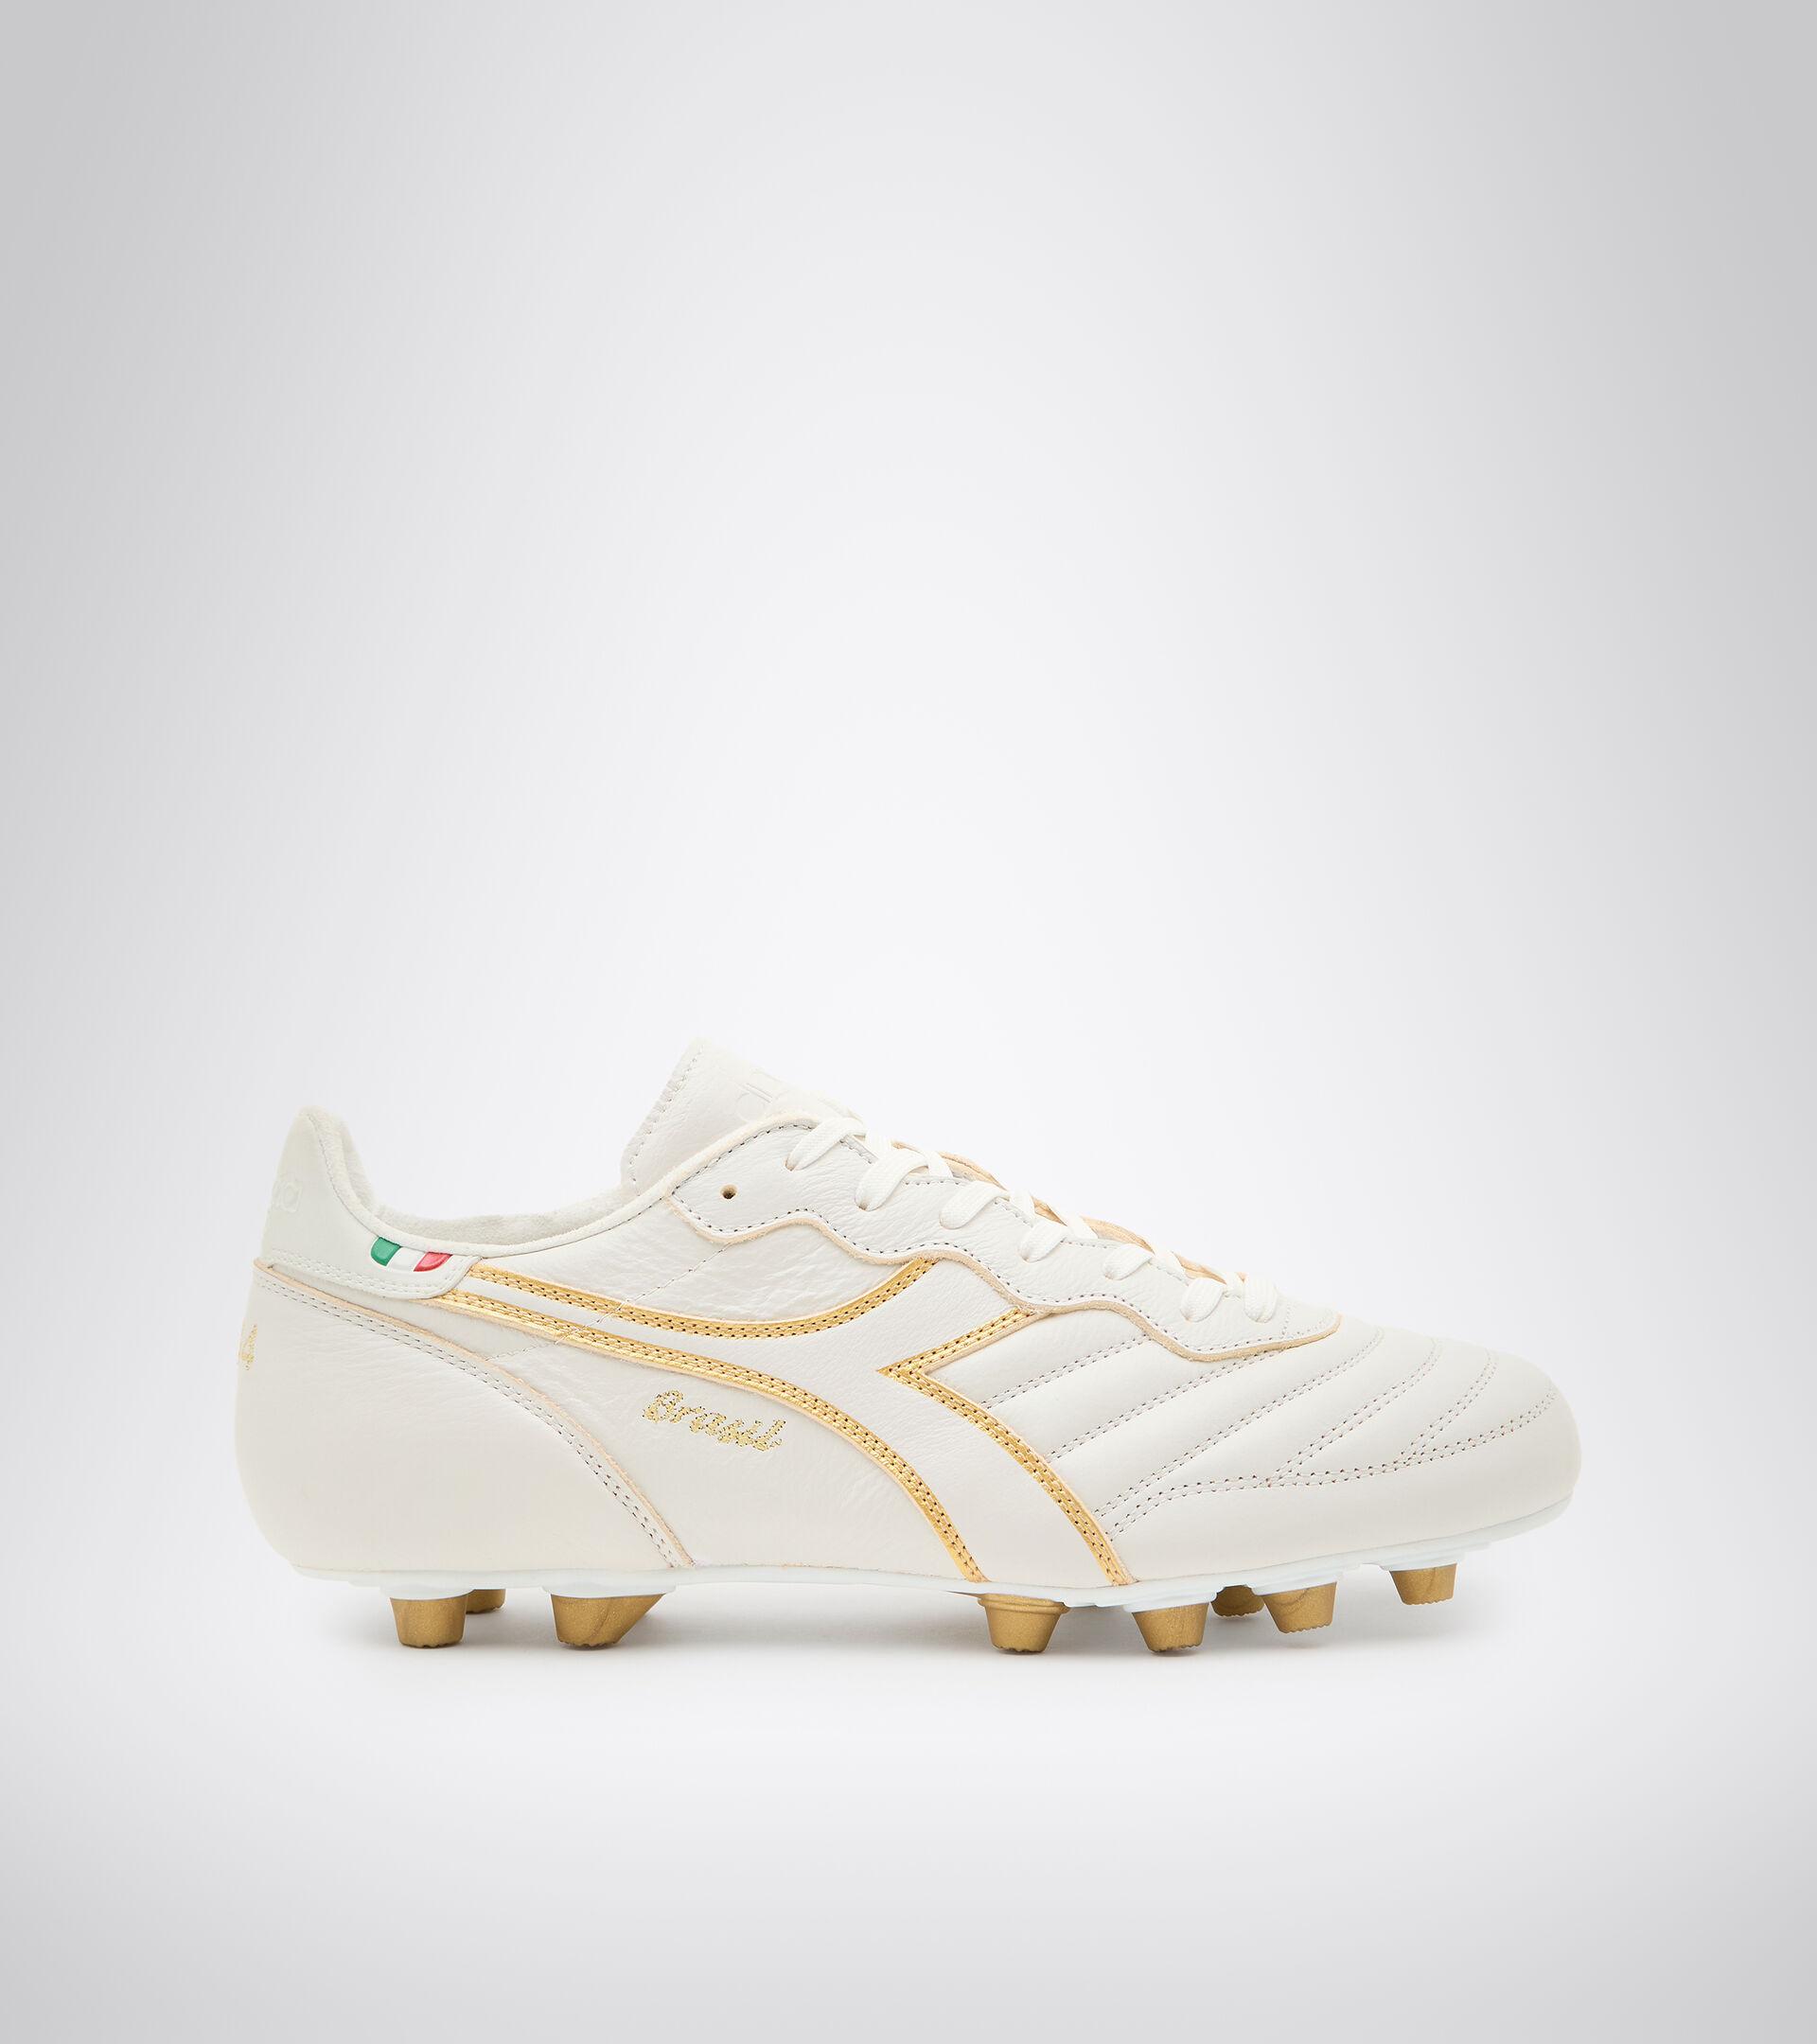 Footwear Sport UOMO BRASIL ITALY OG LT+  MDPU BLANCO/ORO MARRON Diadora